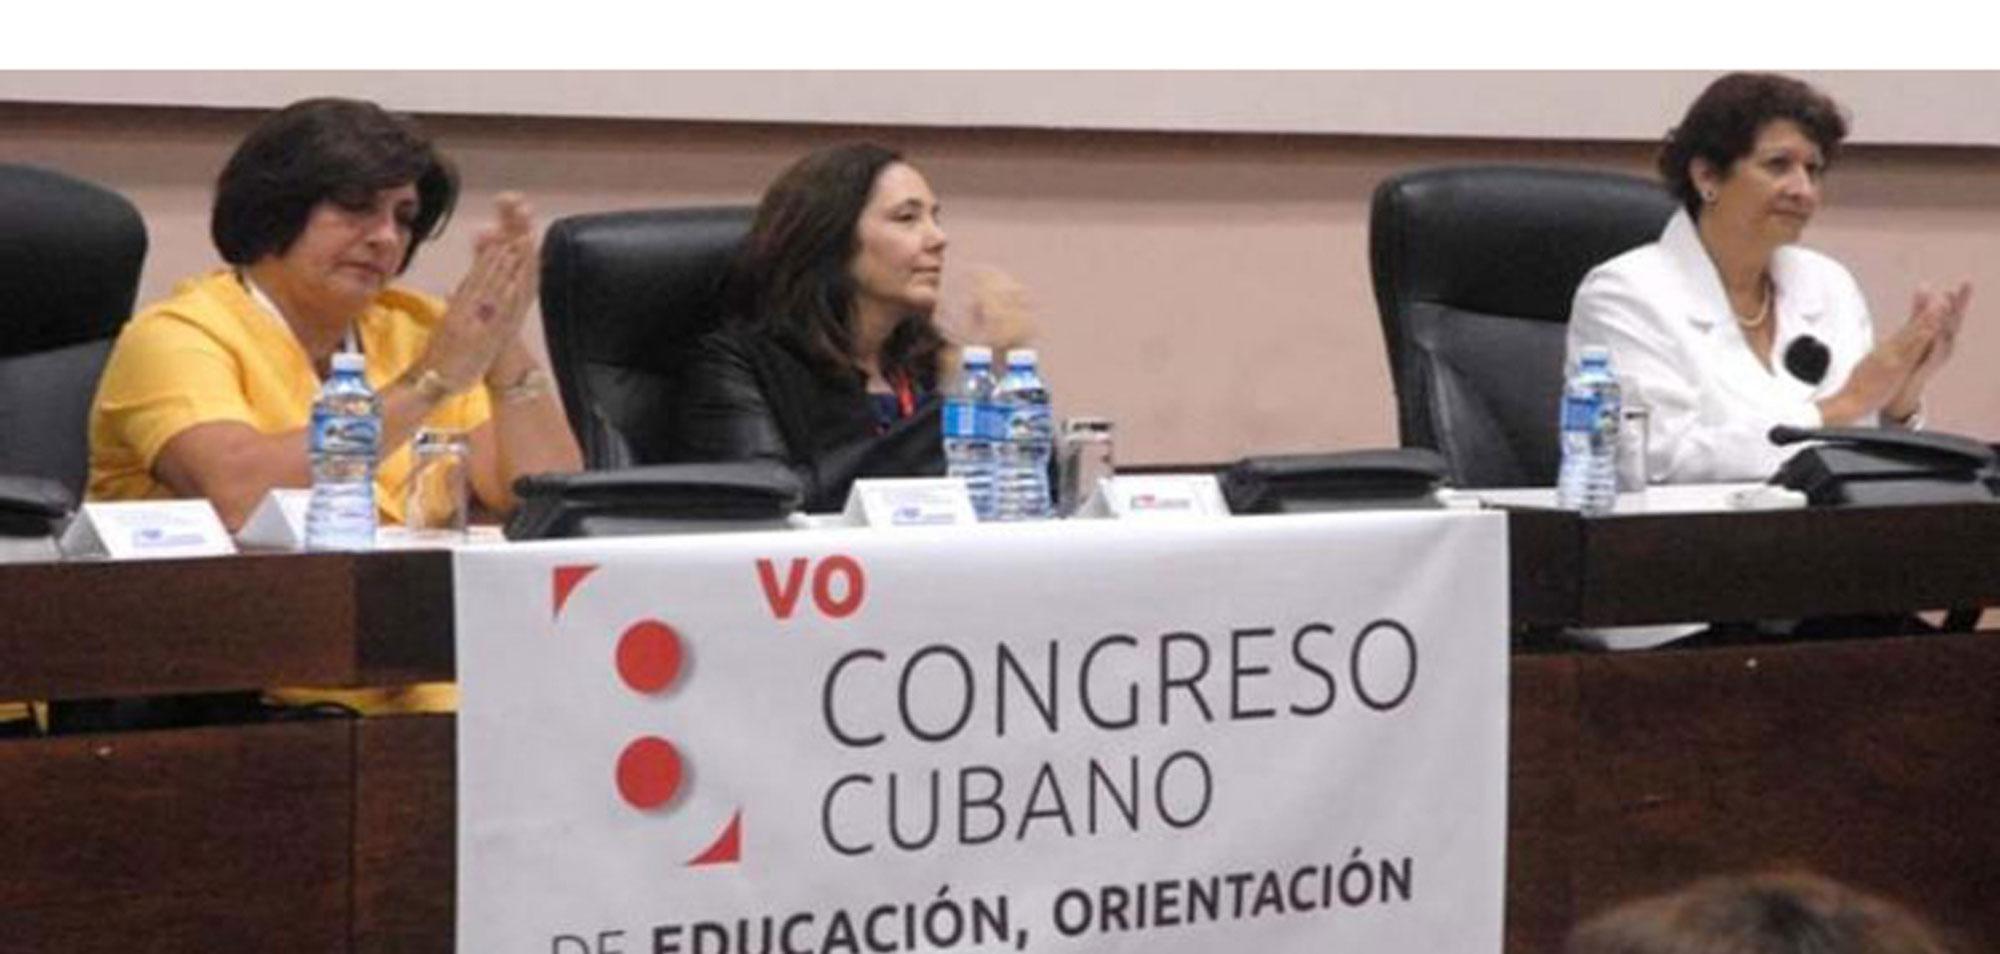 Sexual Education Congress Closes in Cuba